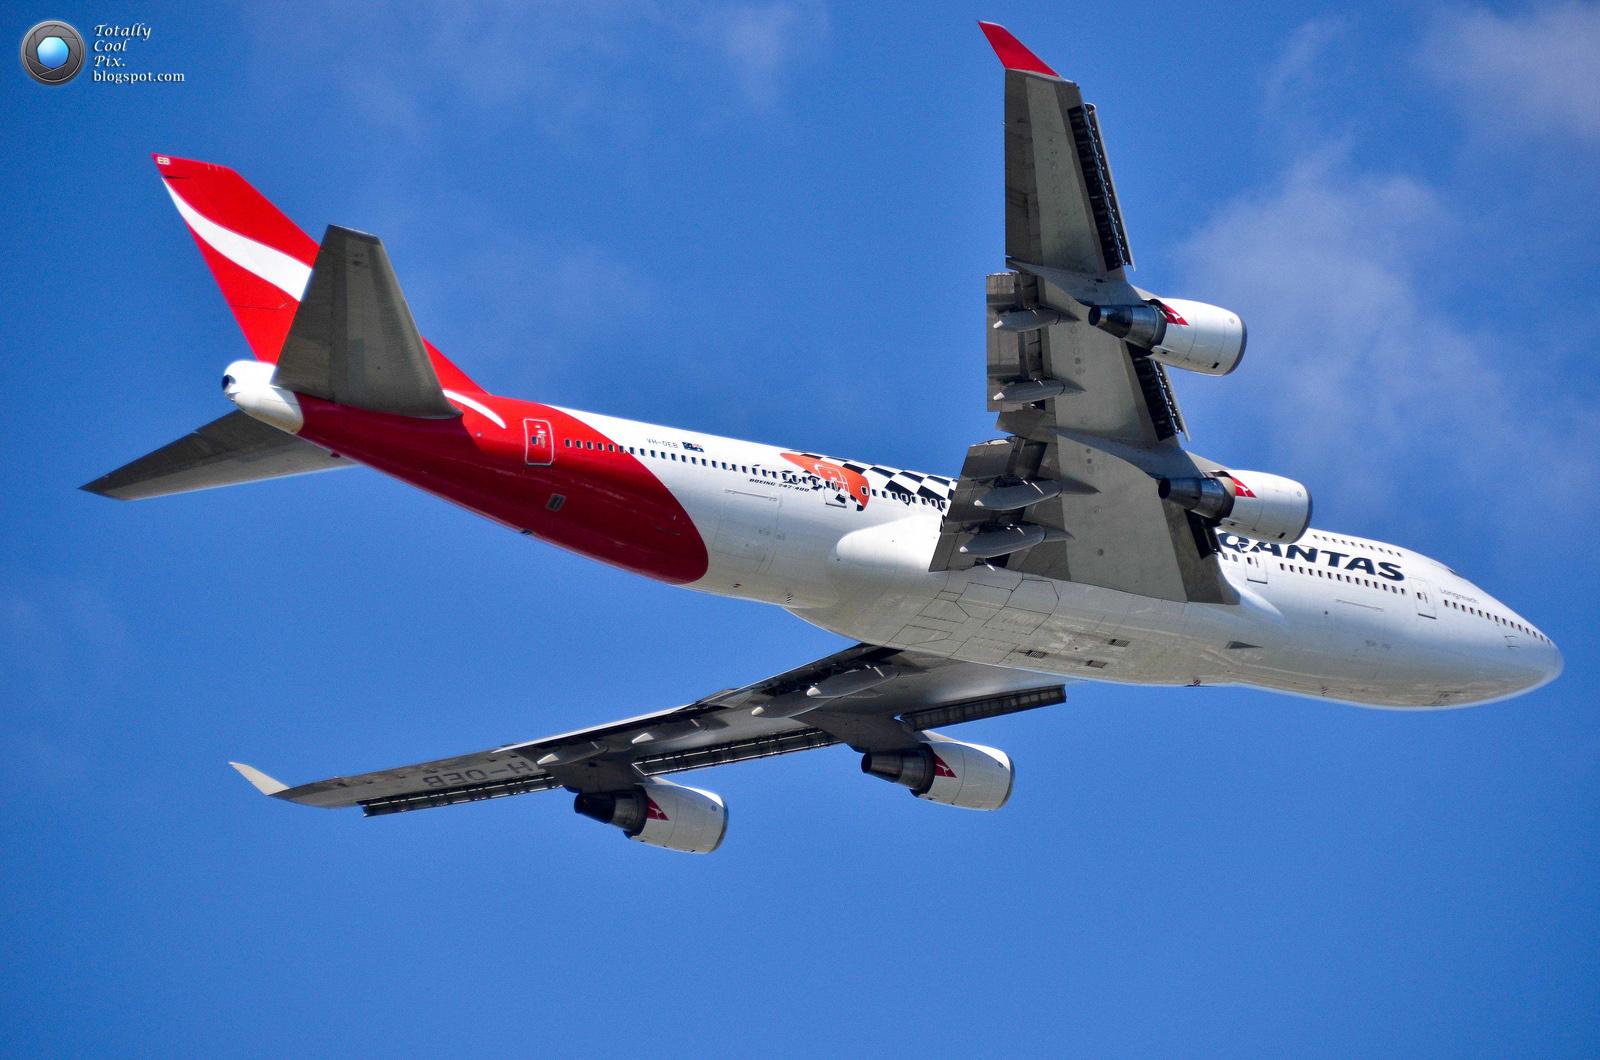 http://4.bp.blogspot.com/-rMcS_KKinzo/T9xWaAsPFnI/AAAAAAAABVI/iZPKa-4_StE/s1600/25-Australia-2012-F1-Grand-Prix-Airshow-Wallpaper-Keith-McInnes-Photography-QANTAS-747.jpg